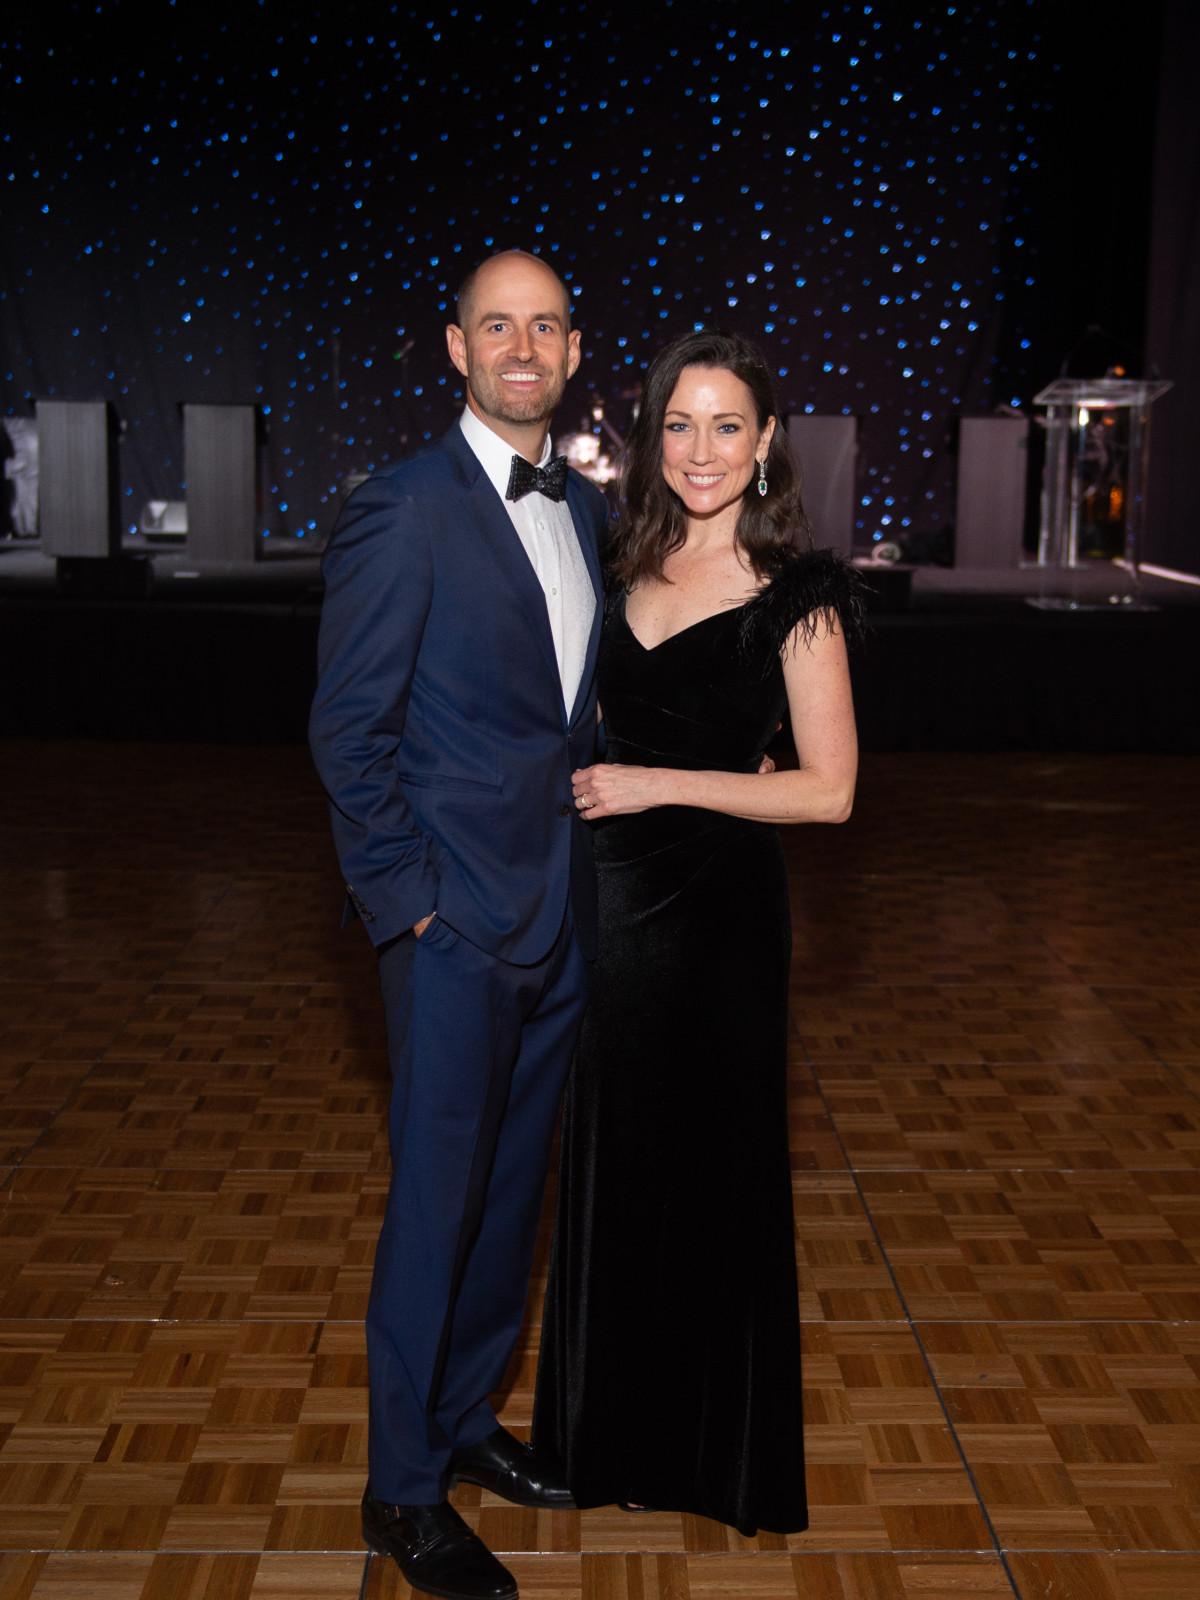 Heart Ball 2020 Ryan and Katie Pryor